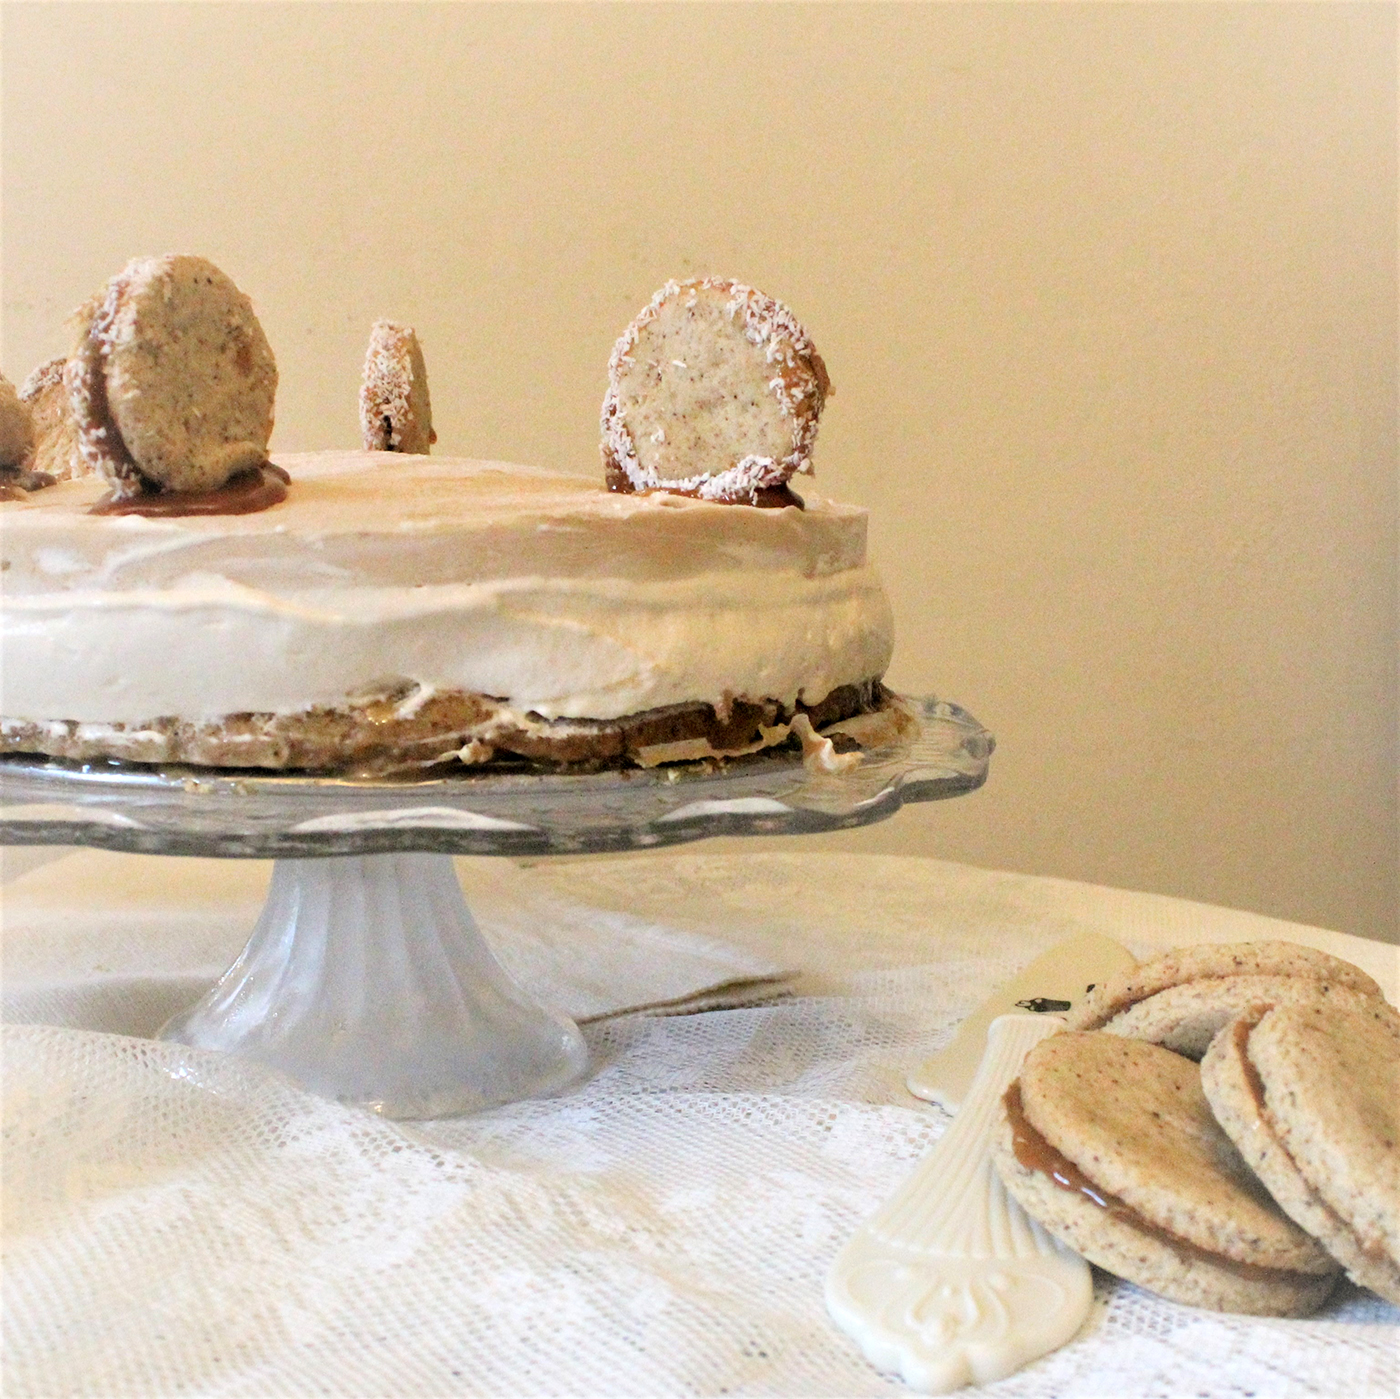 IMG 7780 - עוגת מוס על בסיס אלפחורס